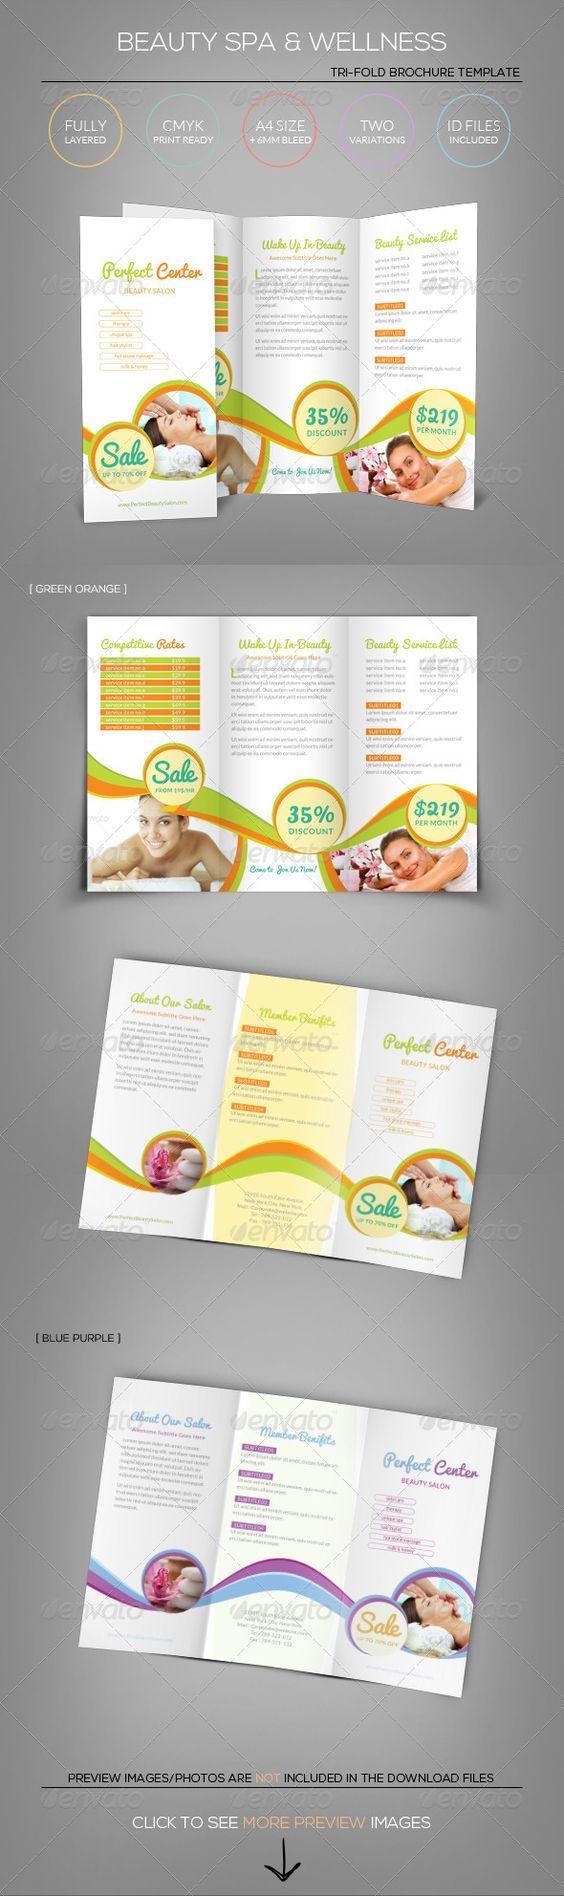 a4 tri fold brochure template - pinterest the world s catalog of ideas